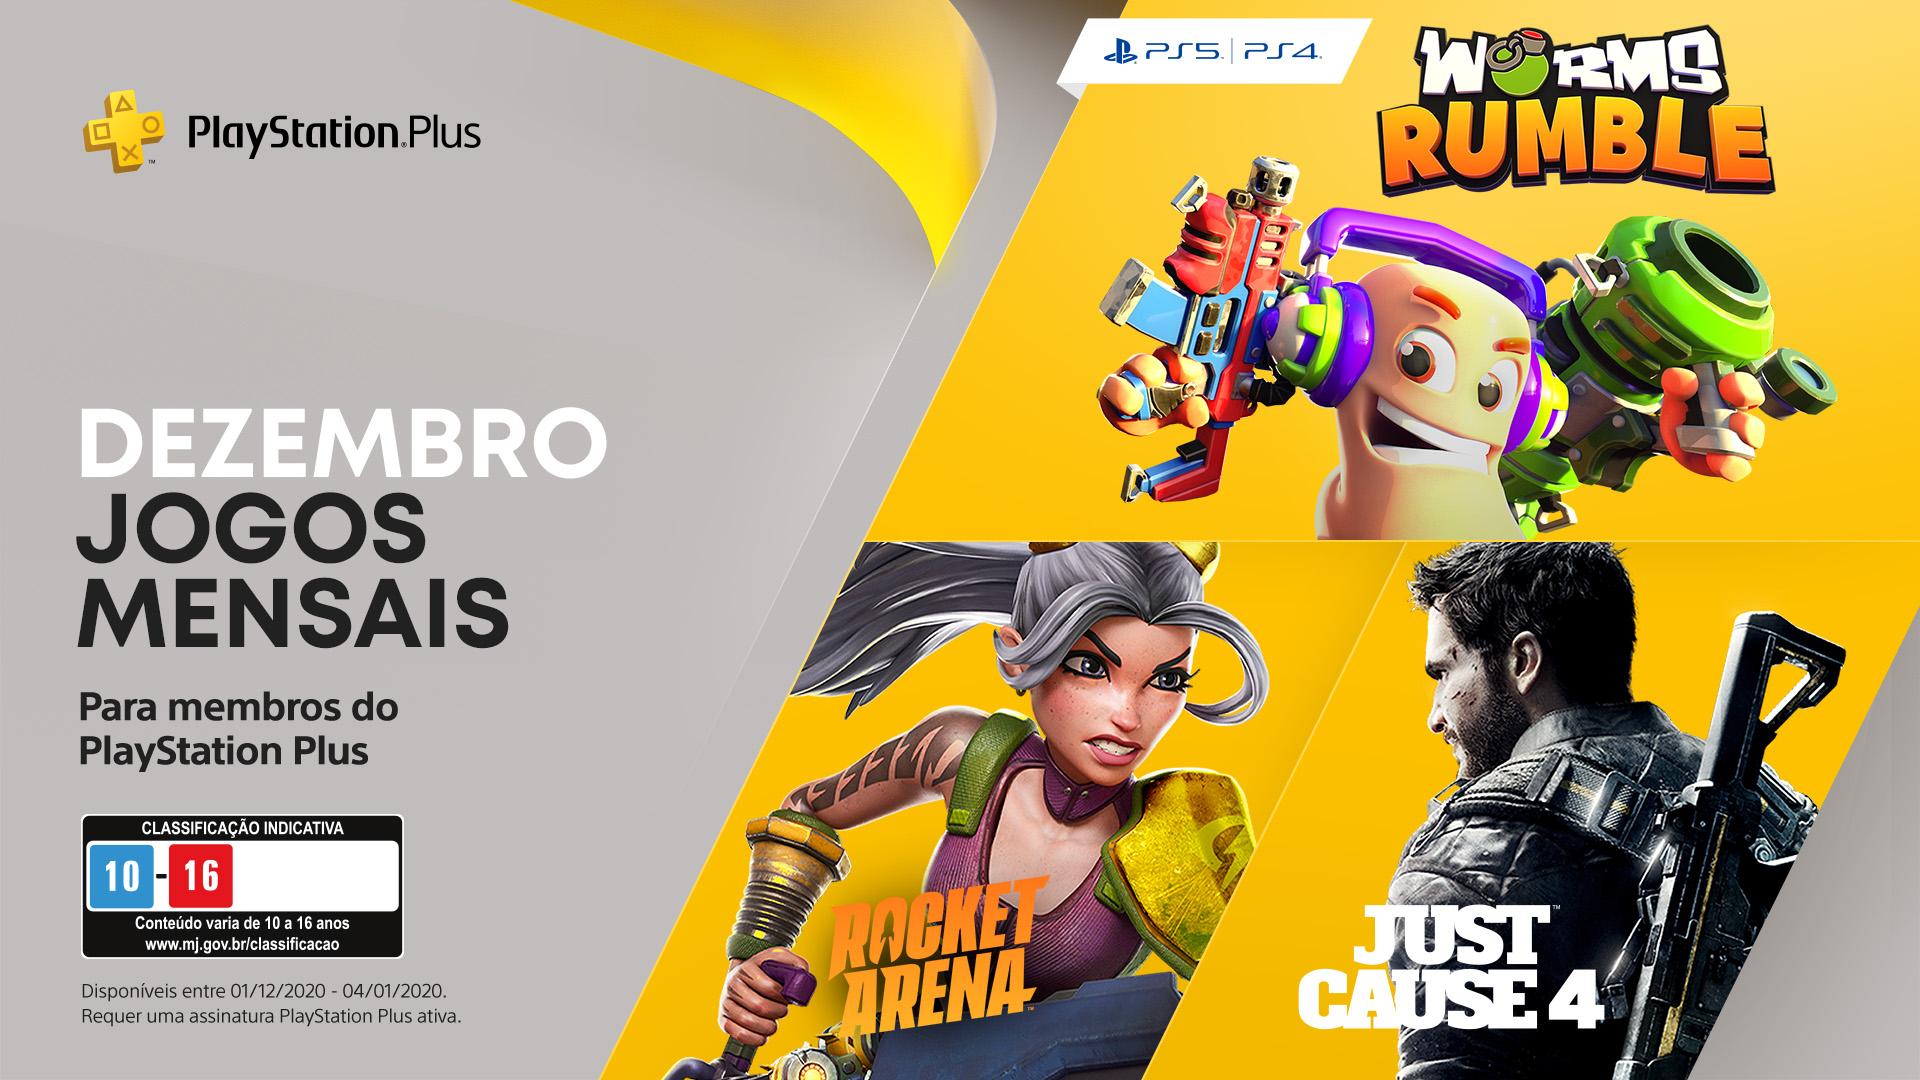 Psn preços jogos 633749